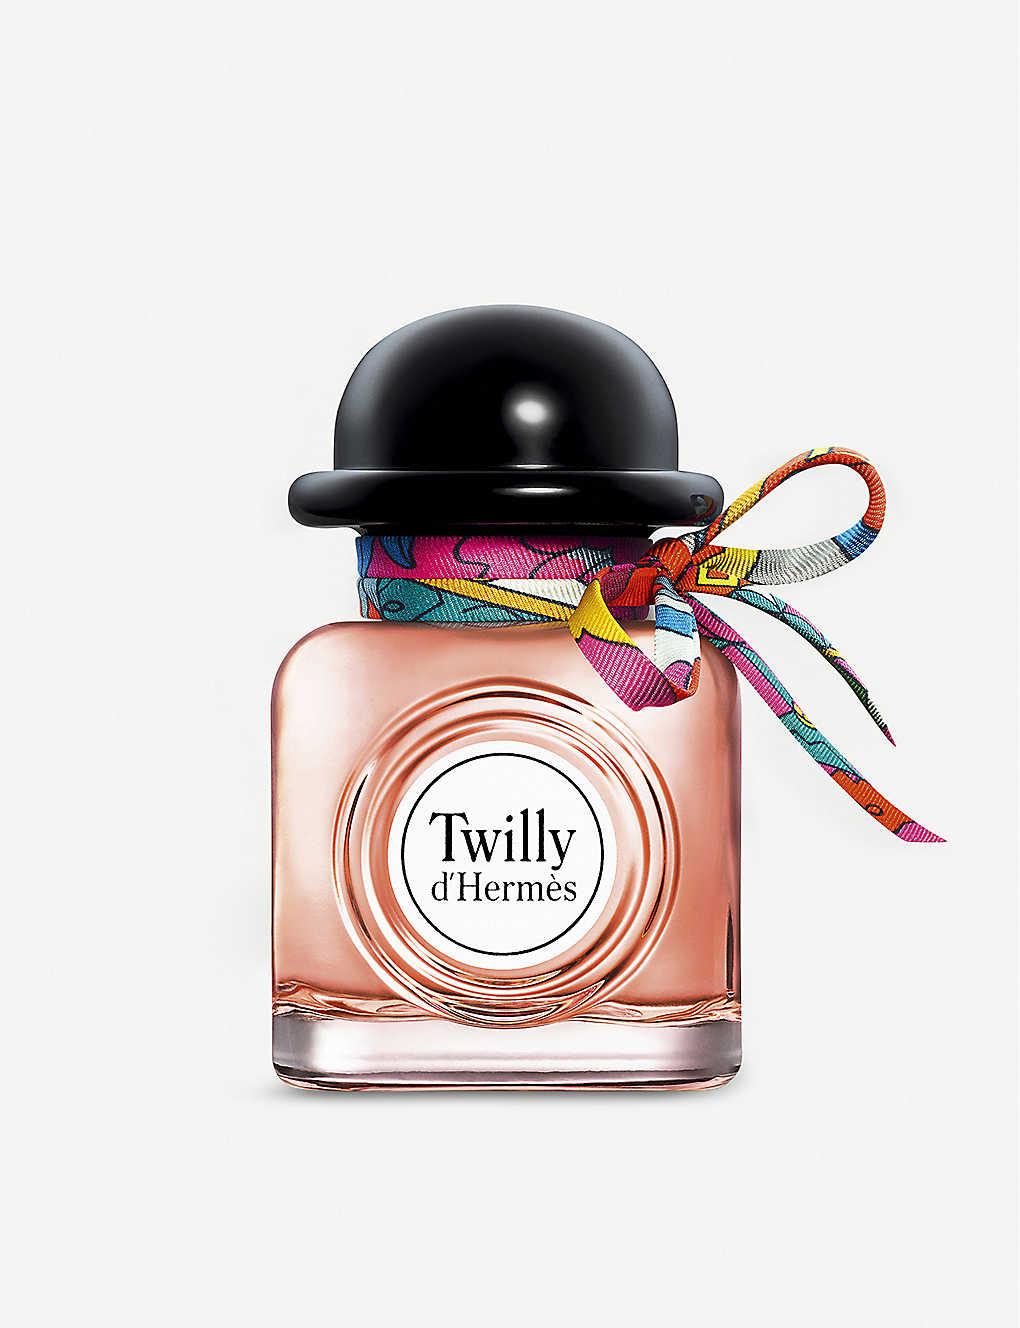 Hermes Twilly Dhermès Eau De Parfum 50ml Selfridgescom